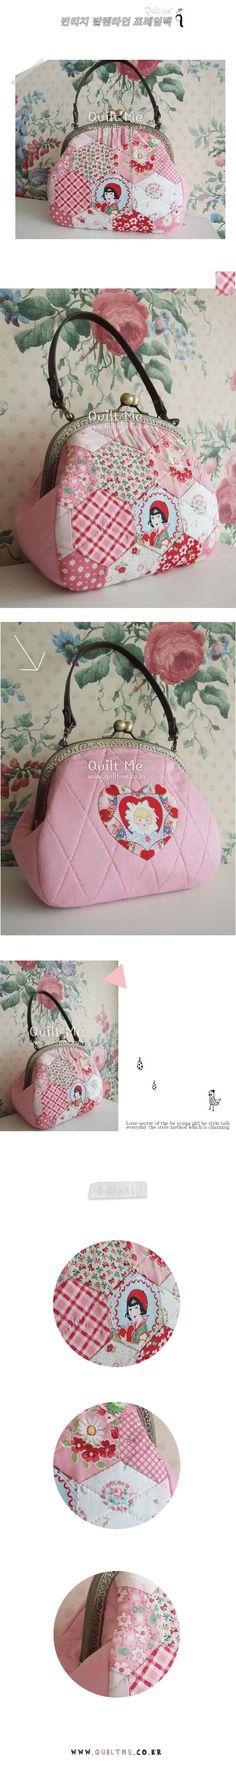 quilt, applique and frame purse